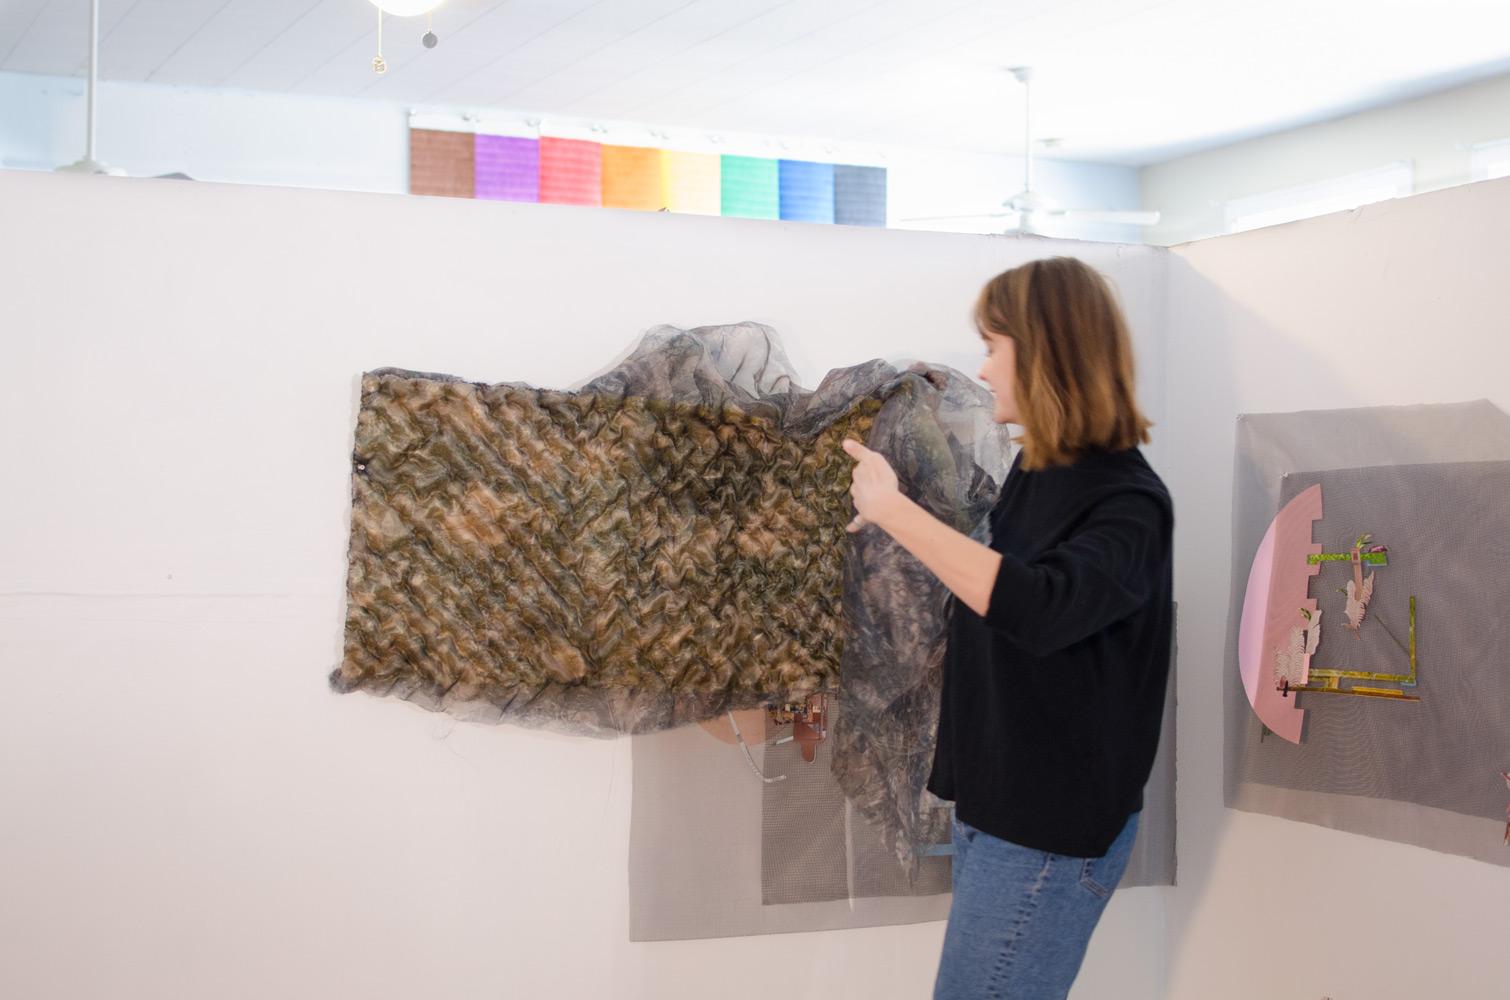 moth-oddities-blog-megan-cline-artists-studio-chicago-15.jpg